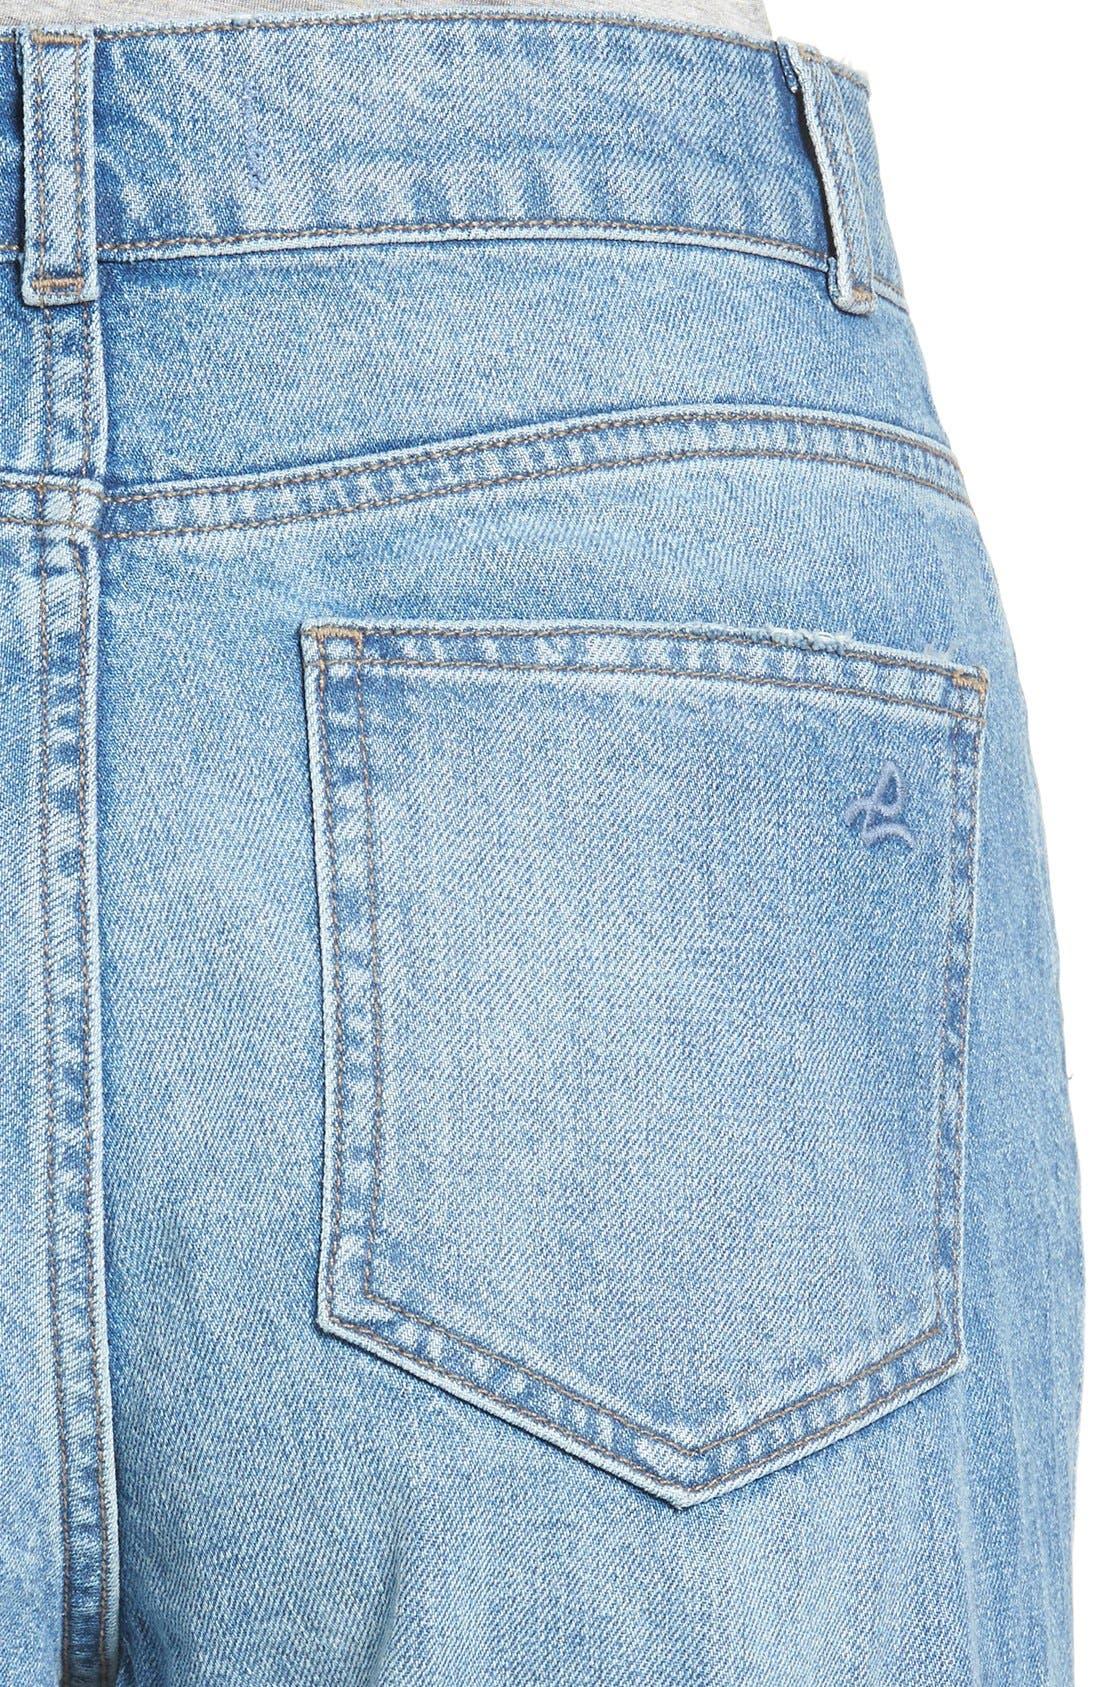 Hepburn High Rise Wide Leg Jeans,                             Alternate thumbnail 3, color,                             425